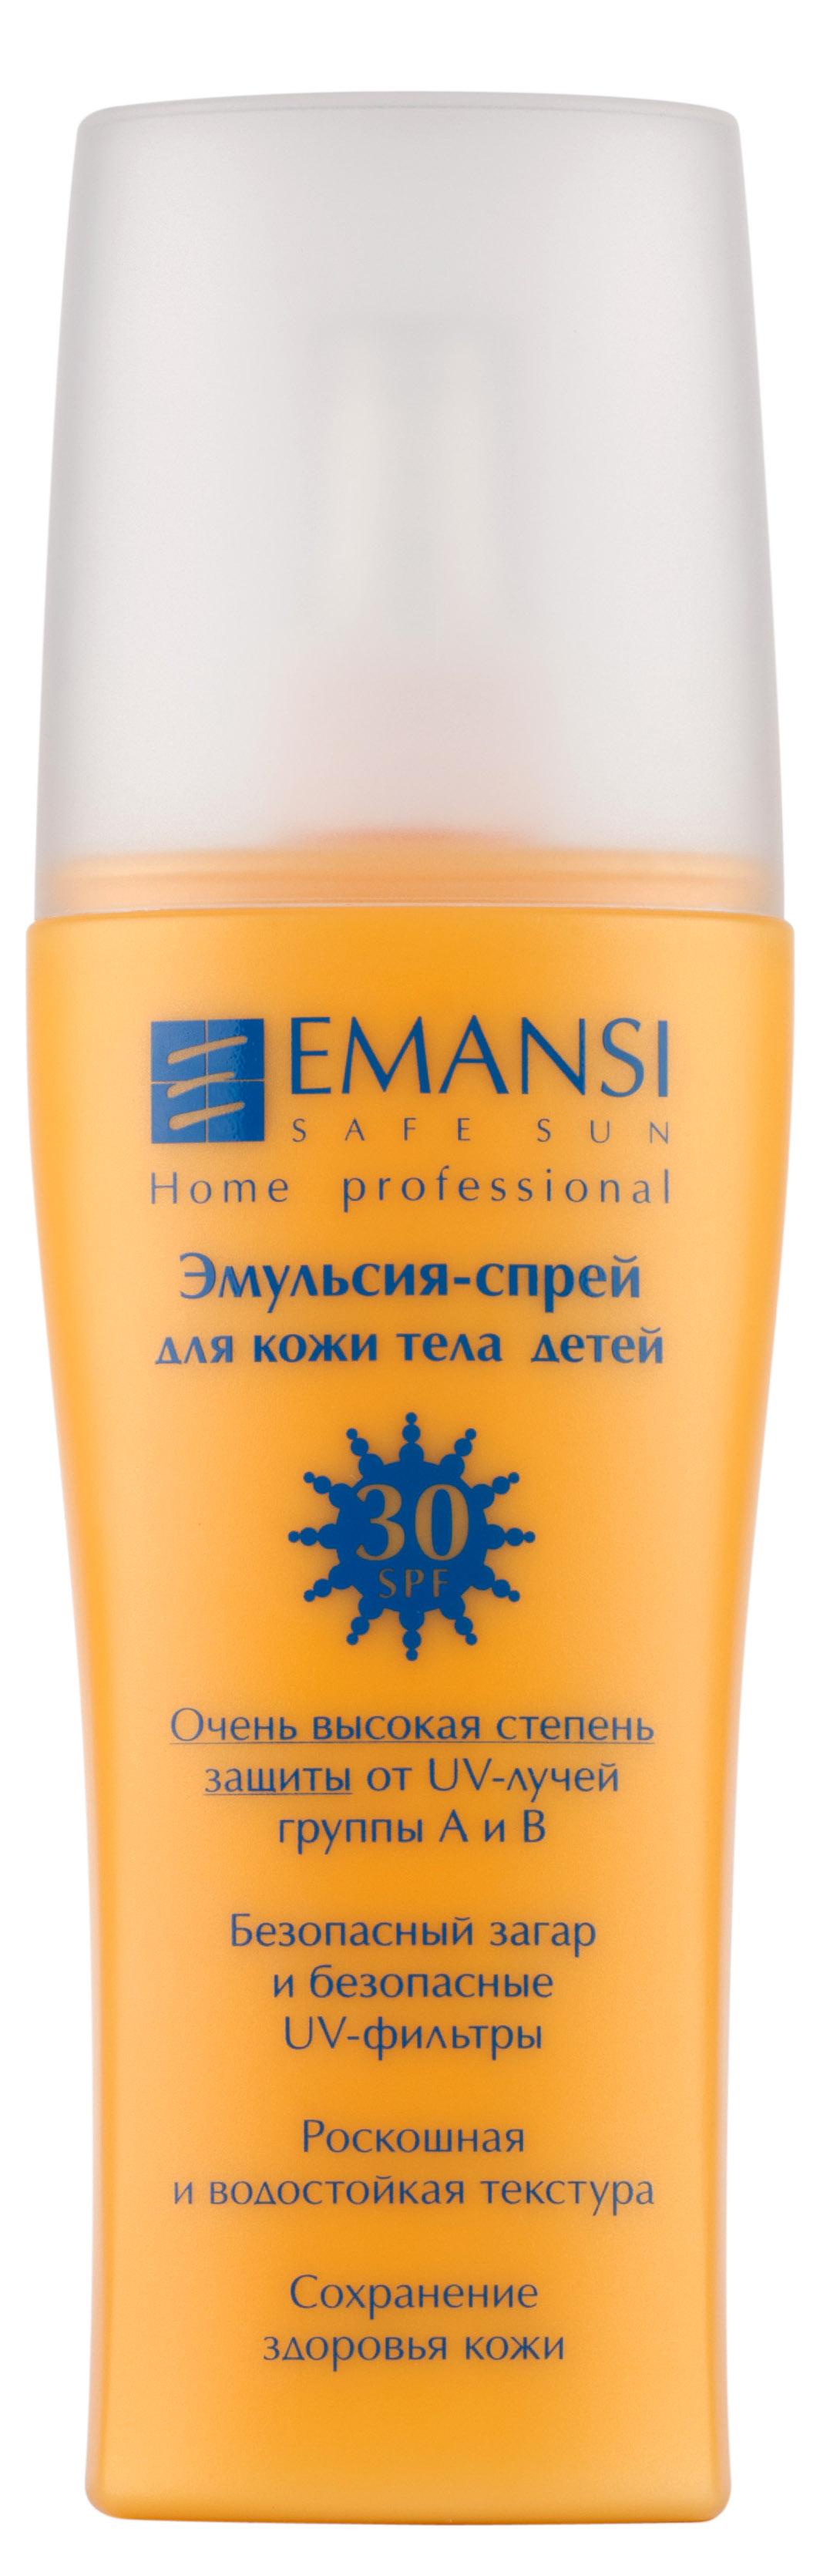 "Emansi Эмульсия для тела детская ""Safe sun"", спрей, SPF 30, 150 мл"